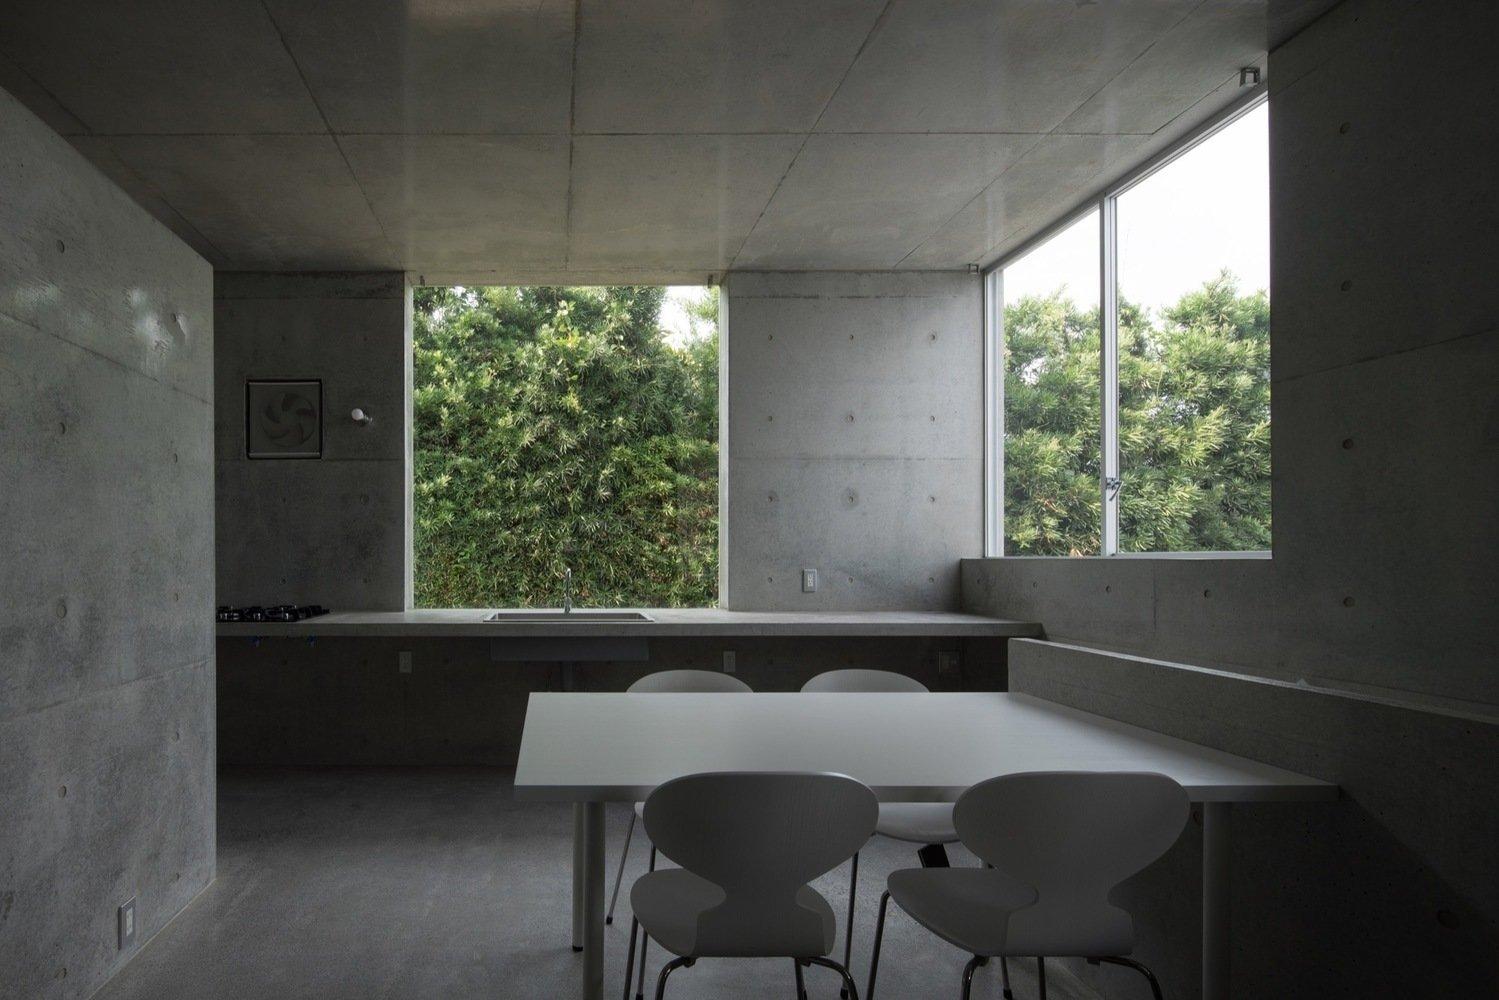 Photo 4 of 6 in House in Akitsu by Kazunori Fujimoto Architect & Associates